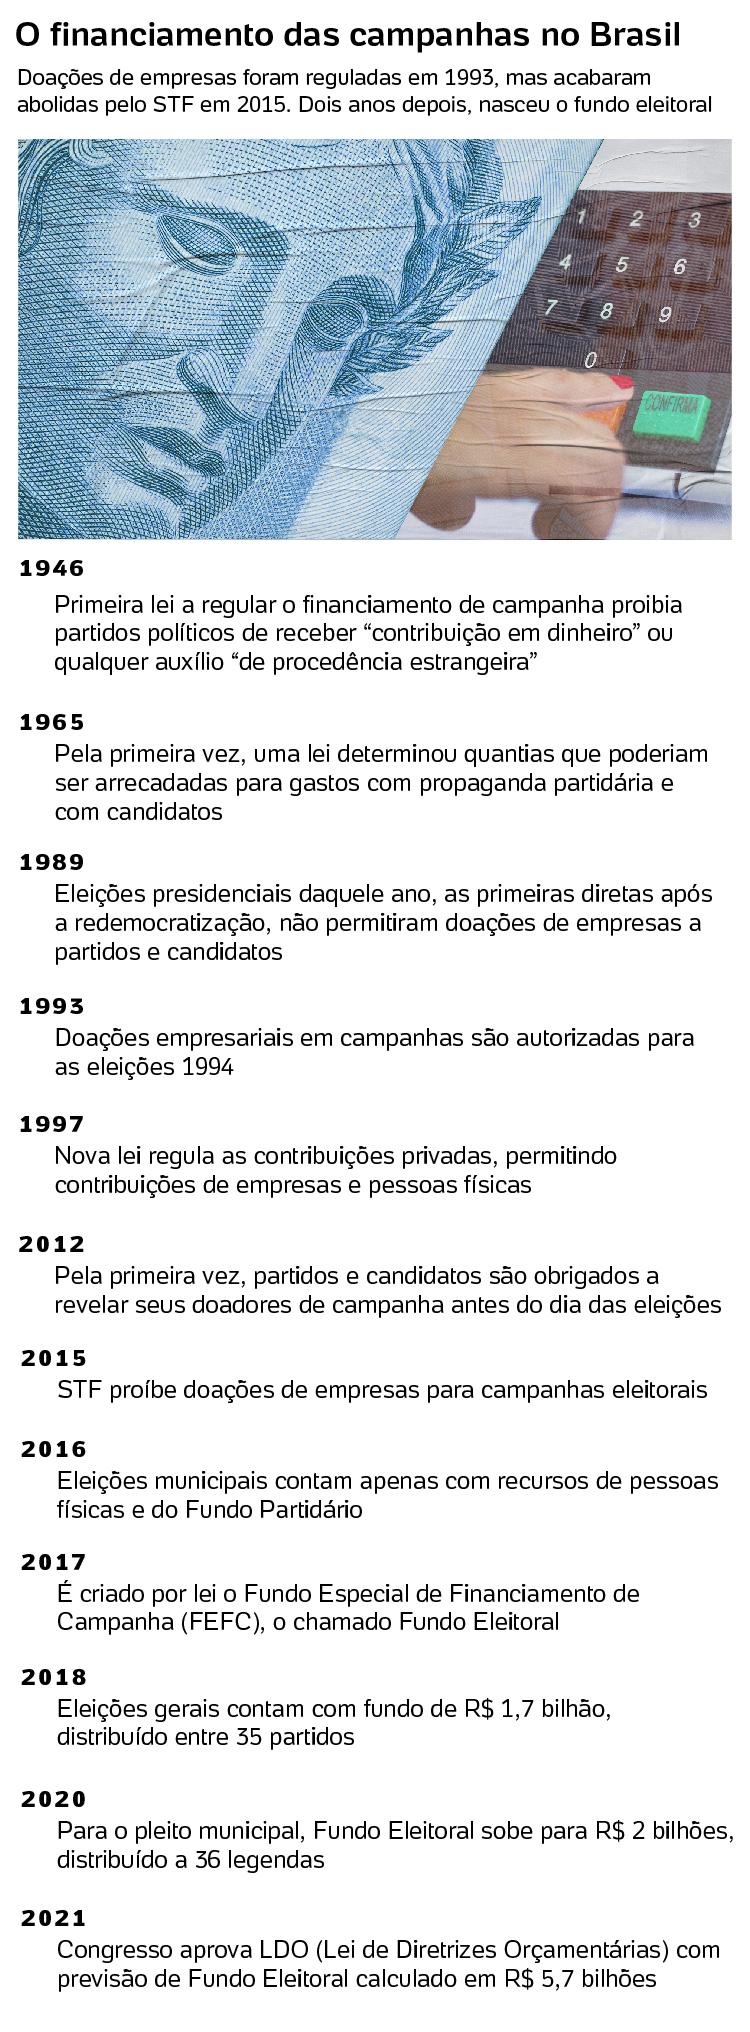 Timeline do Fundão - Arte/UOL - Arte/UOL